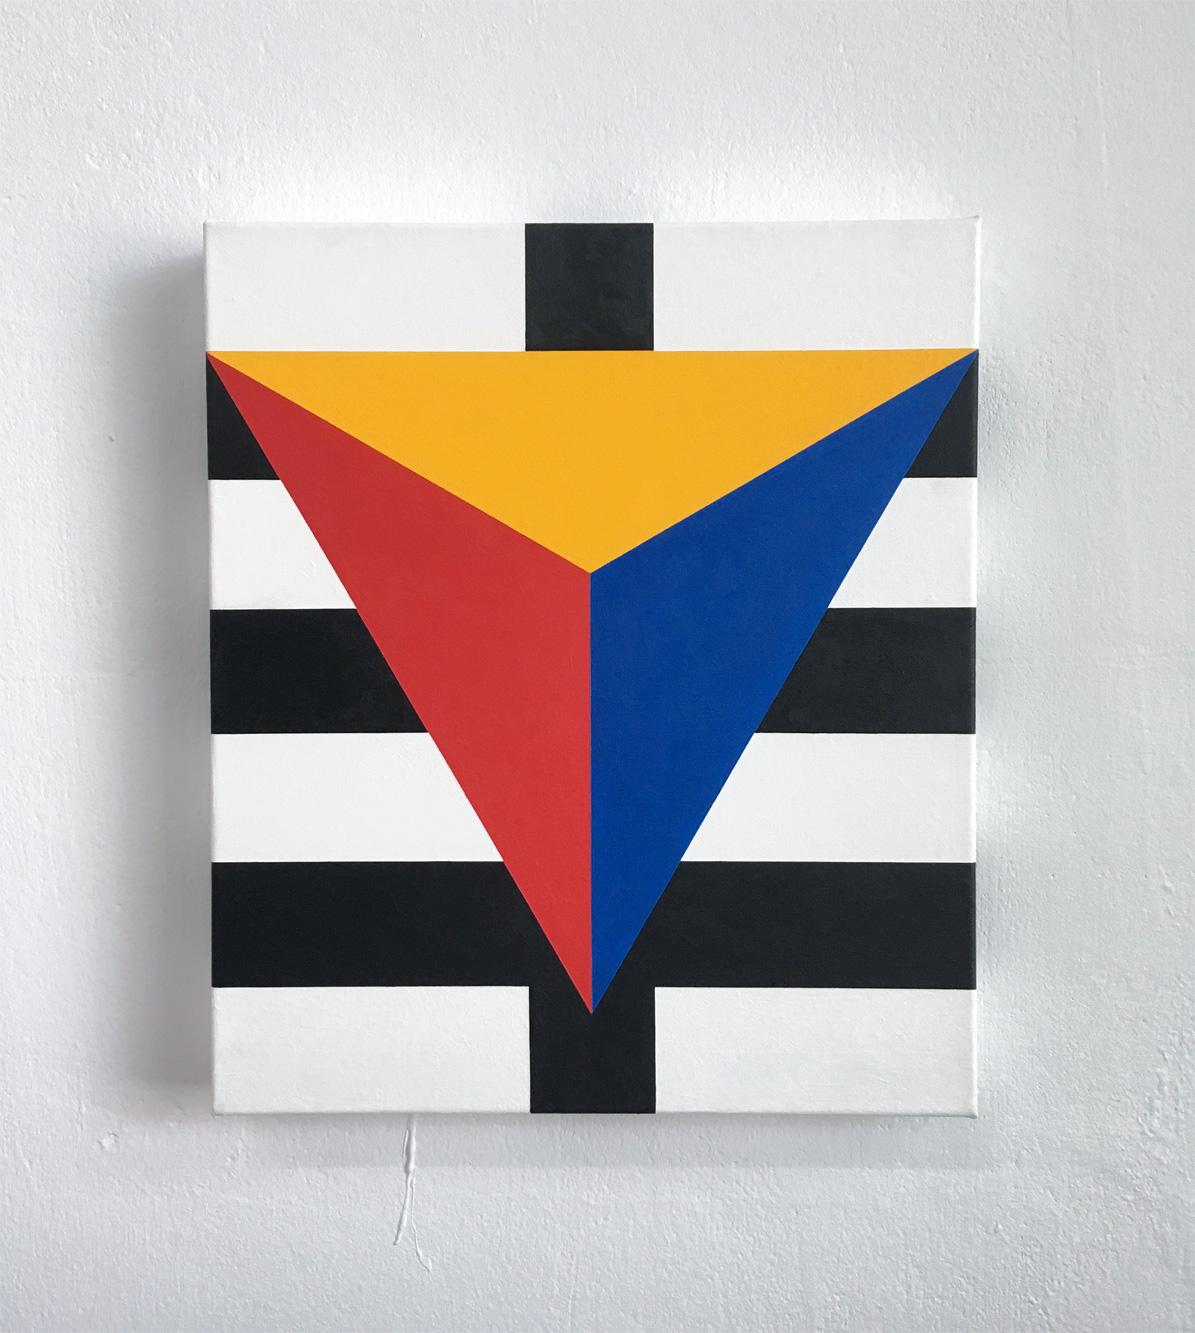 Vidya  30 x 35 x 3.5 Acrylic on canvas 2018    _  ropp schouten